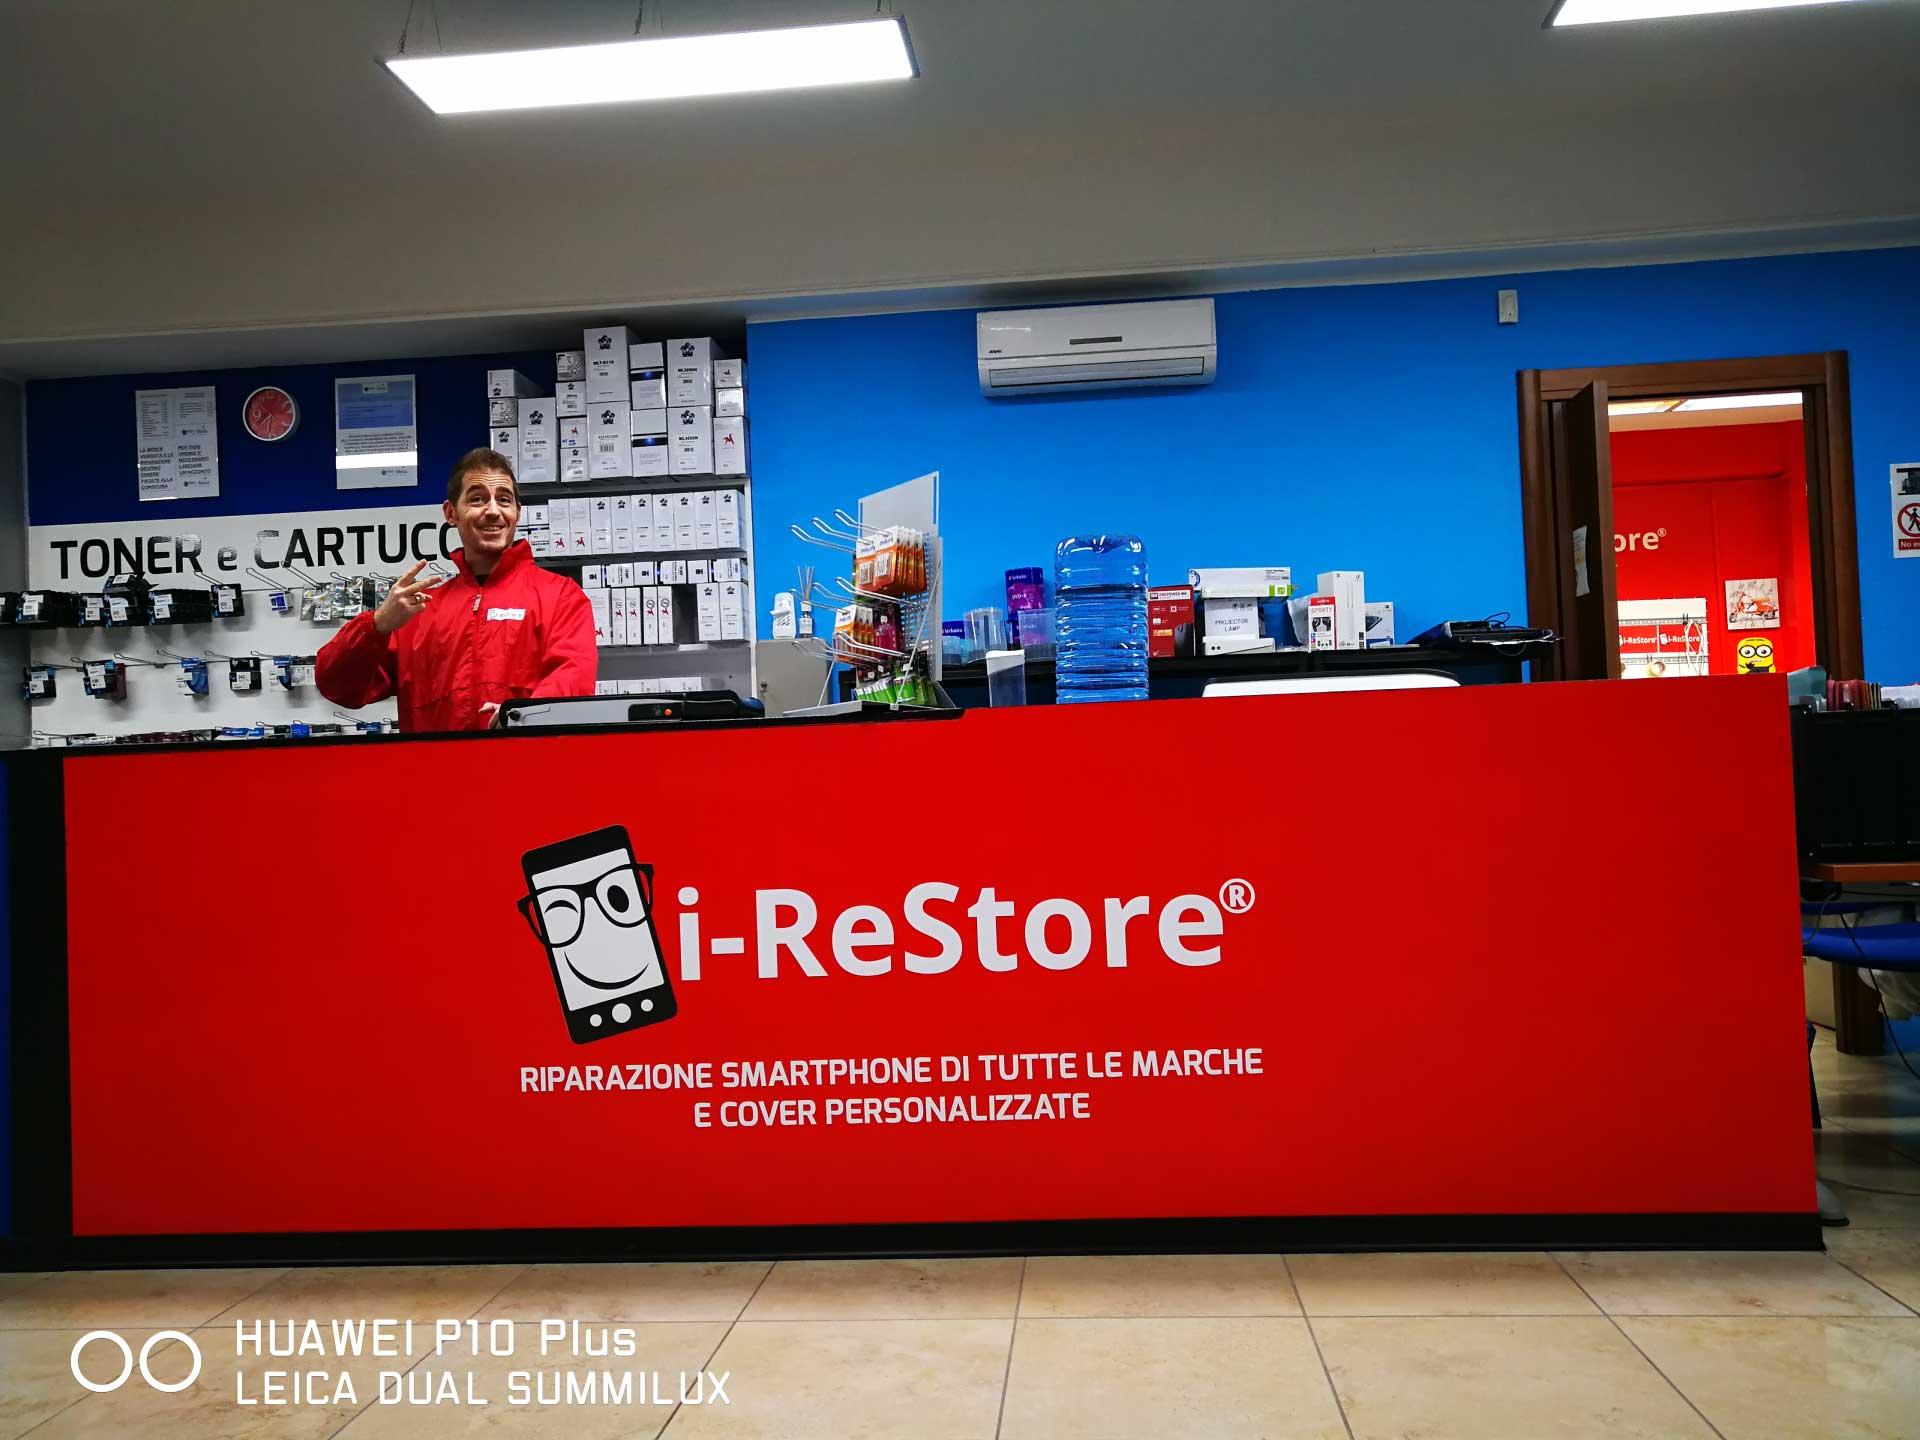 i-restore-umbertide-riparazione-smartphone-tablet-3